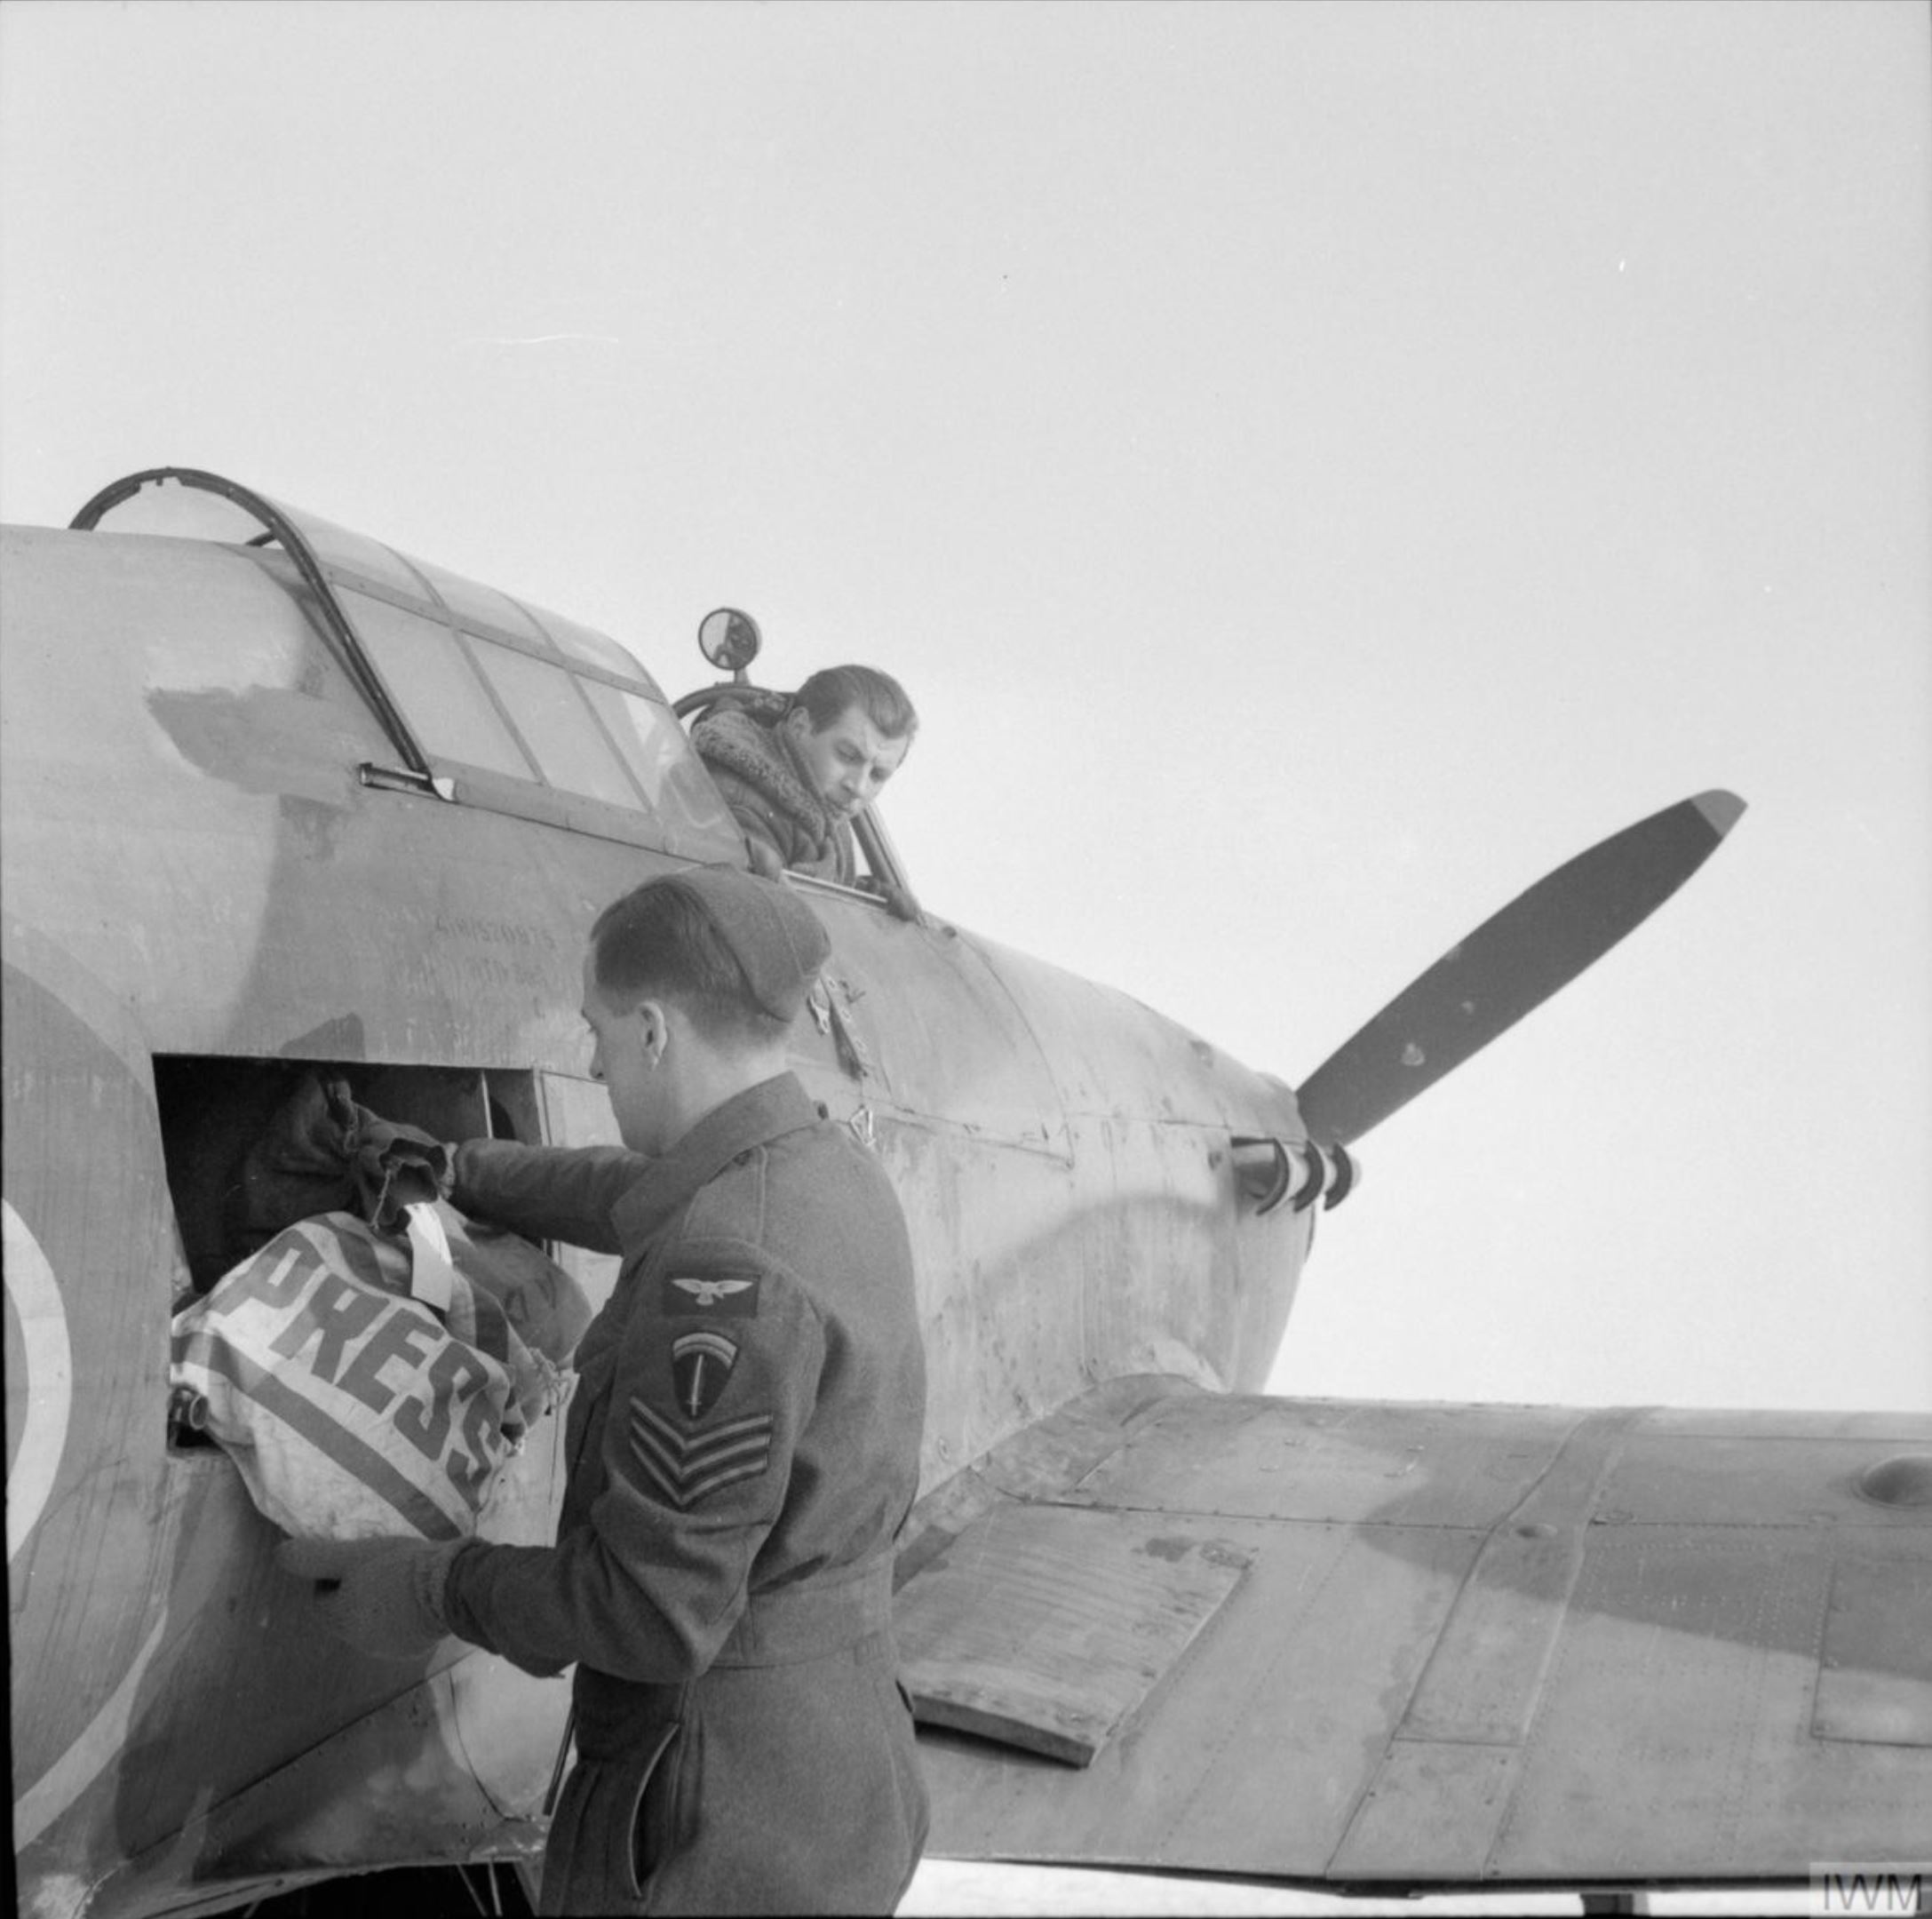 Hurricane IIc RAF 1697ADLS courier aircraft at Le Bourget France 1944 IWM BU1672